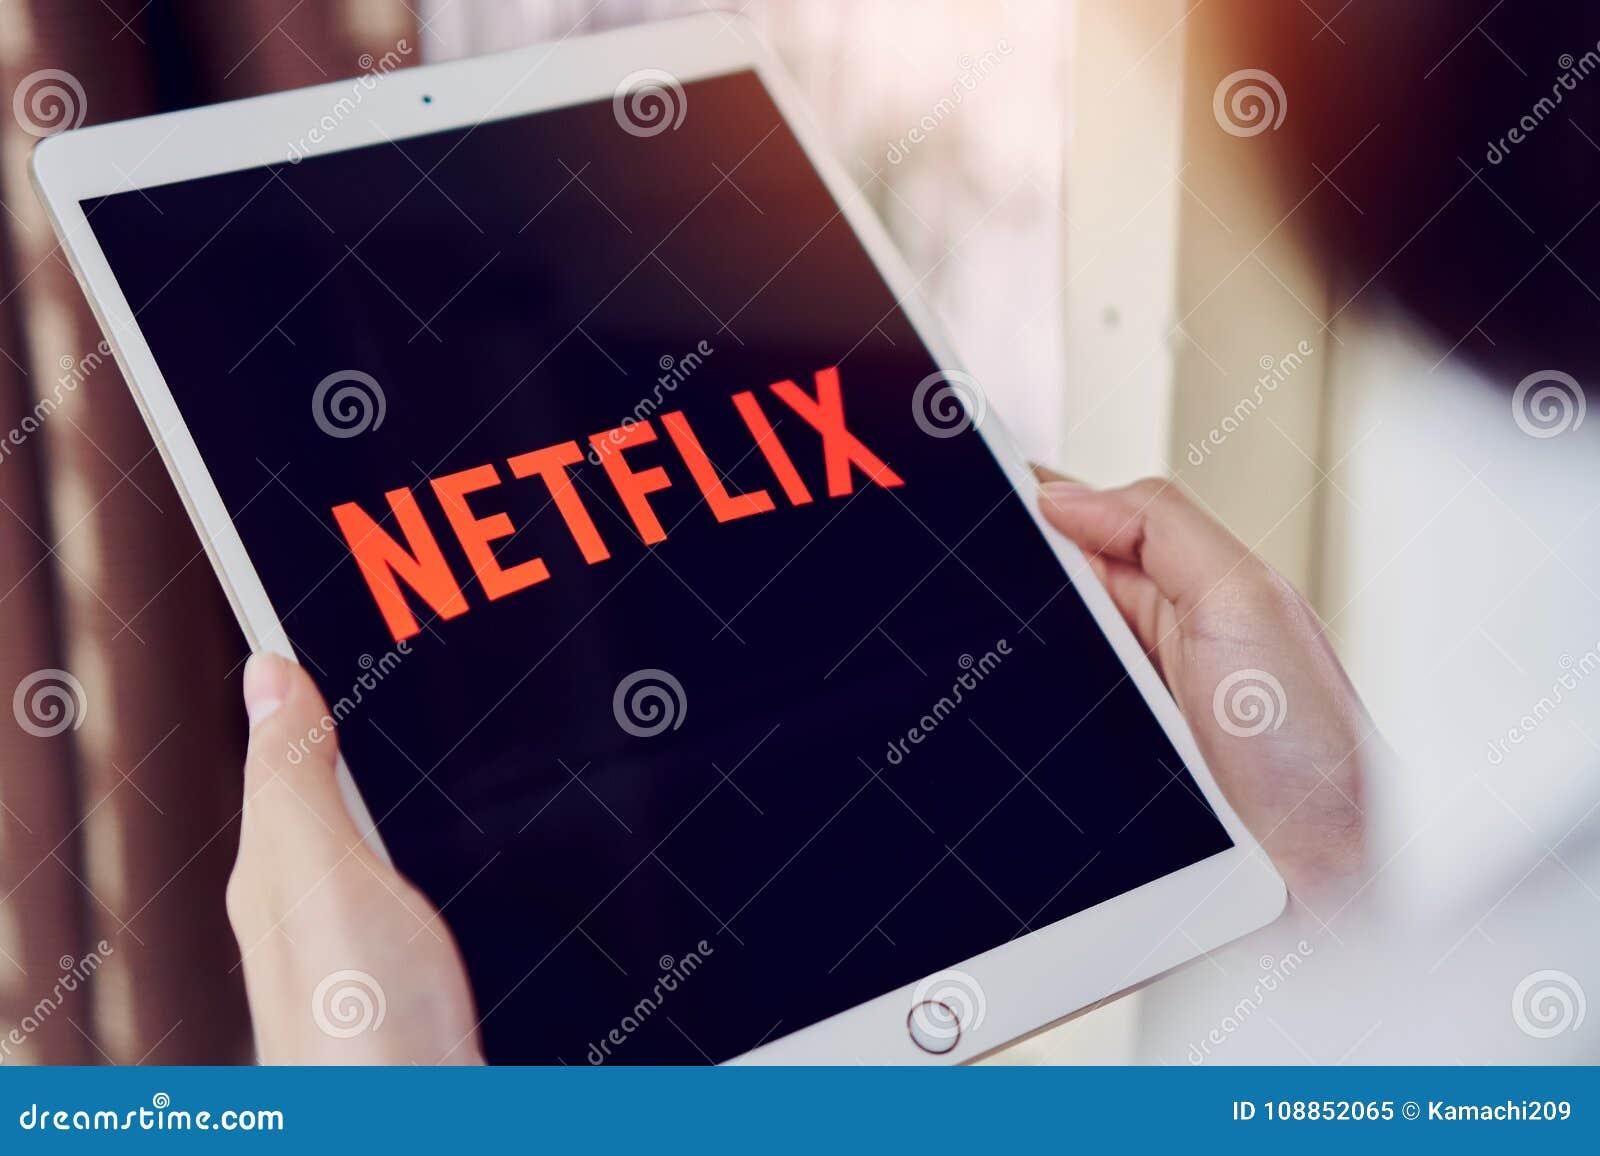 Bangkok, Thailand - January 31, 2018 : Netflix app on tablet screen. Netflix is an international leading subscription service.